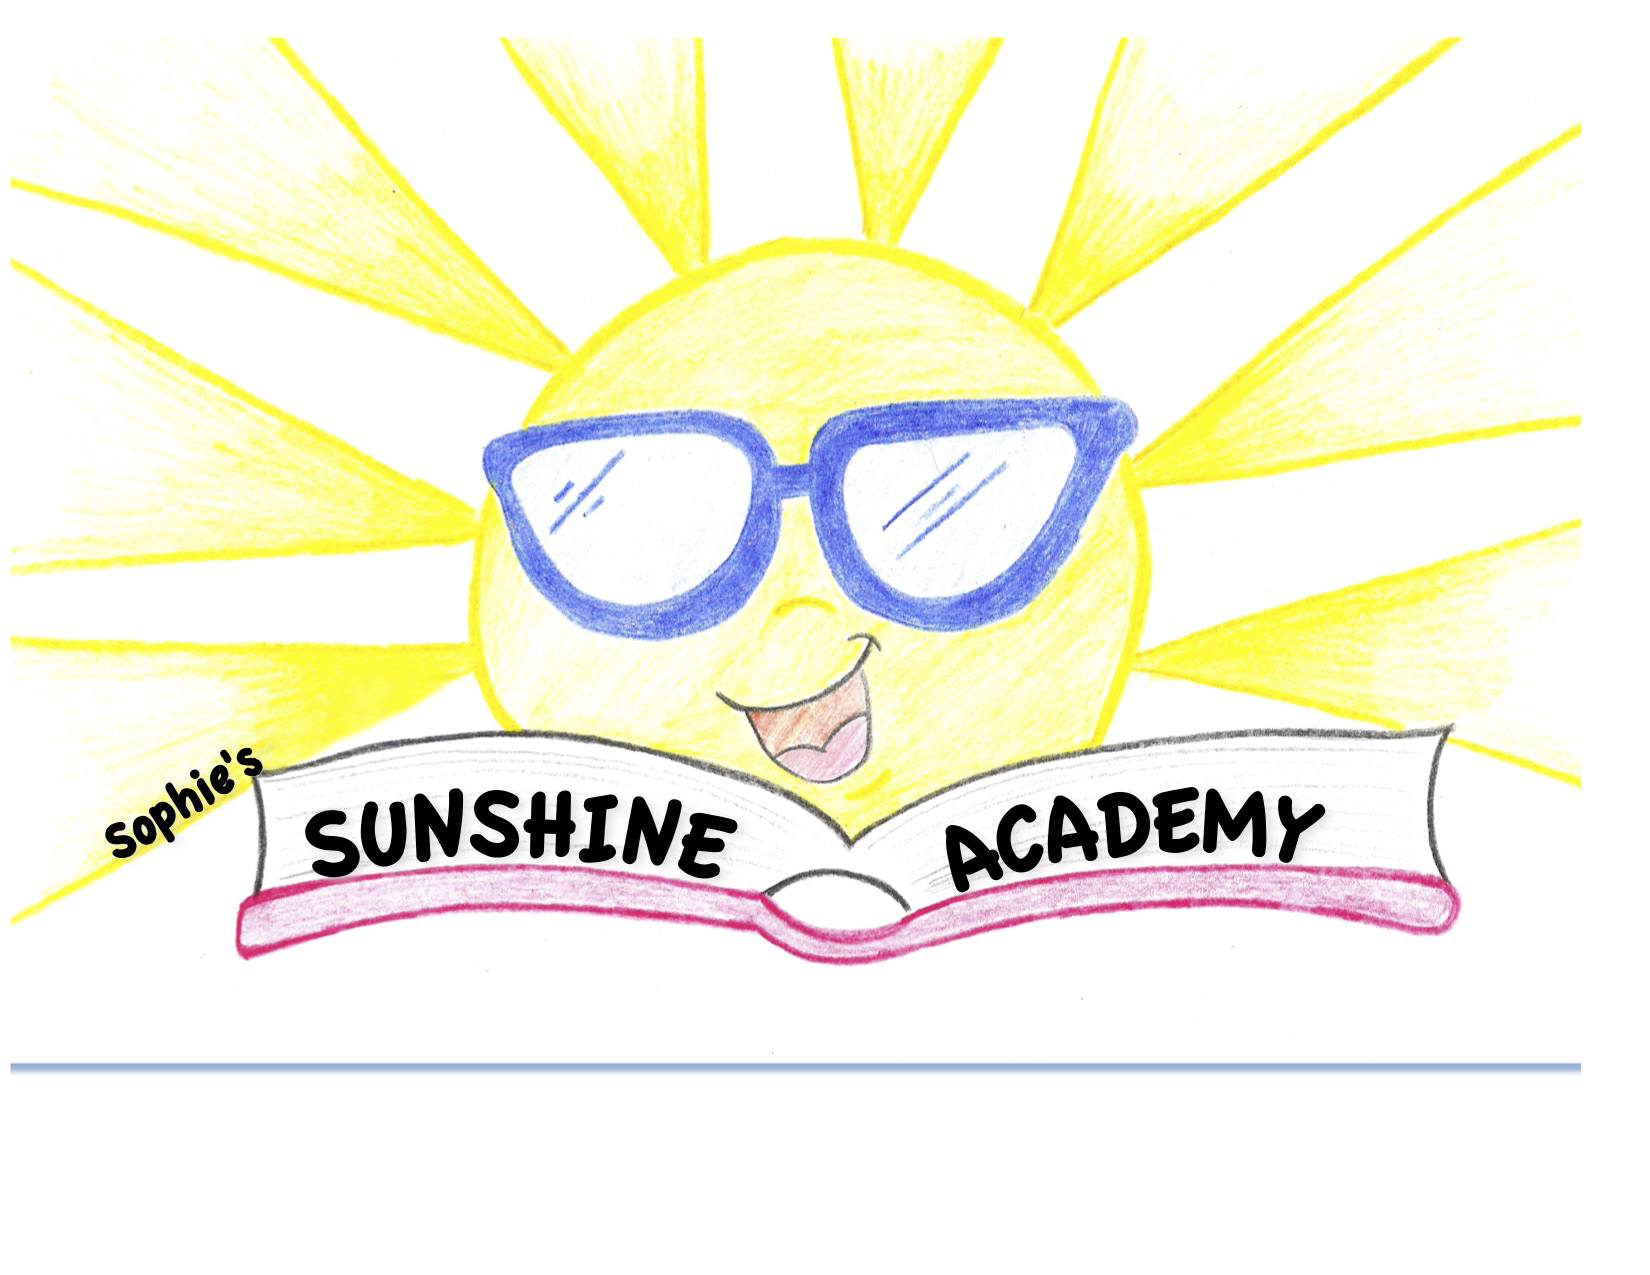 Sophie Farah's Sunshine Academy